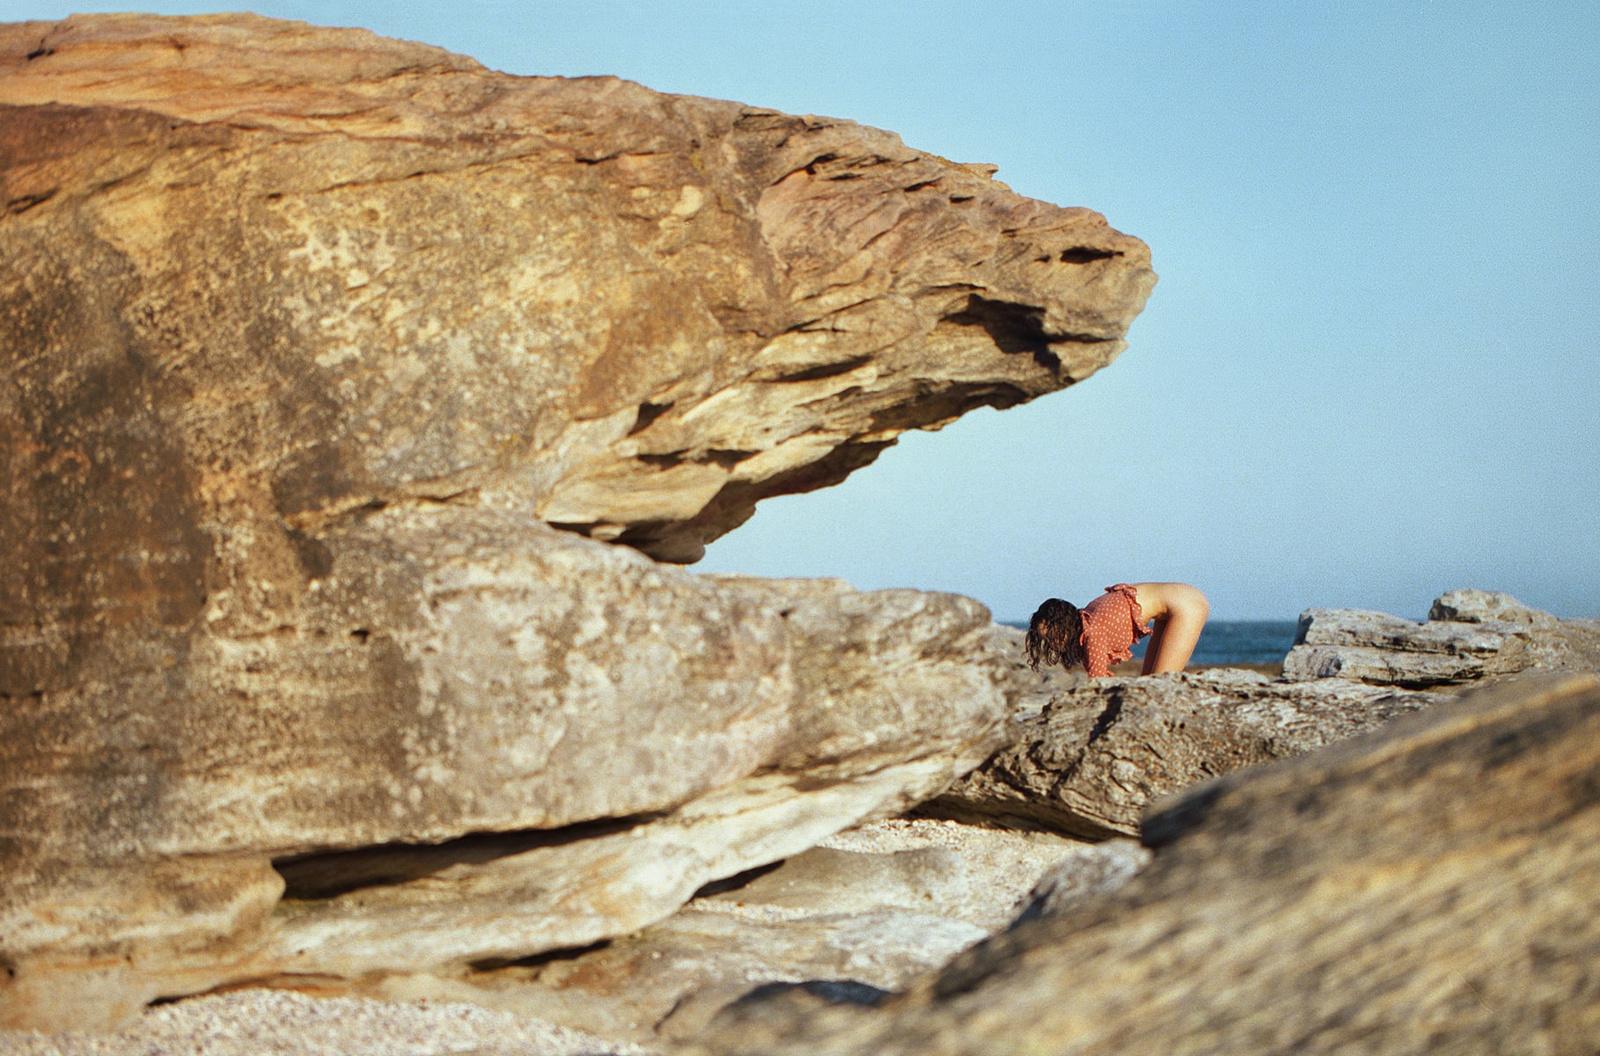 sarah-stephens-seaside-erotic-photo-by-cameron-mackie-01